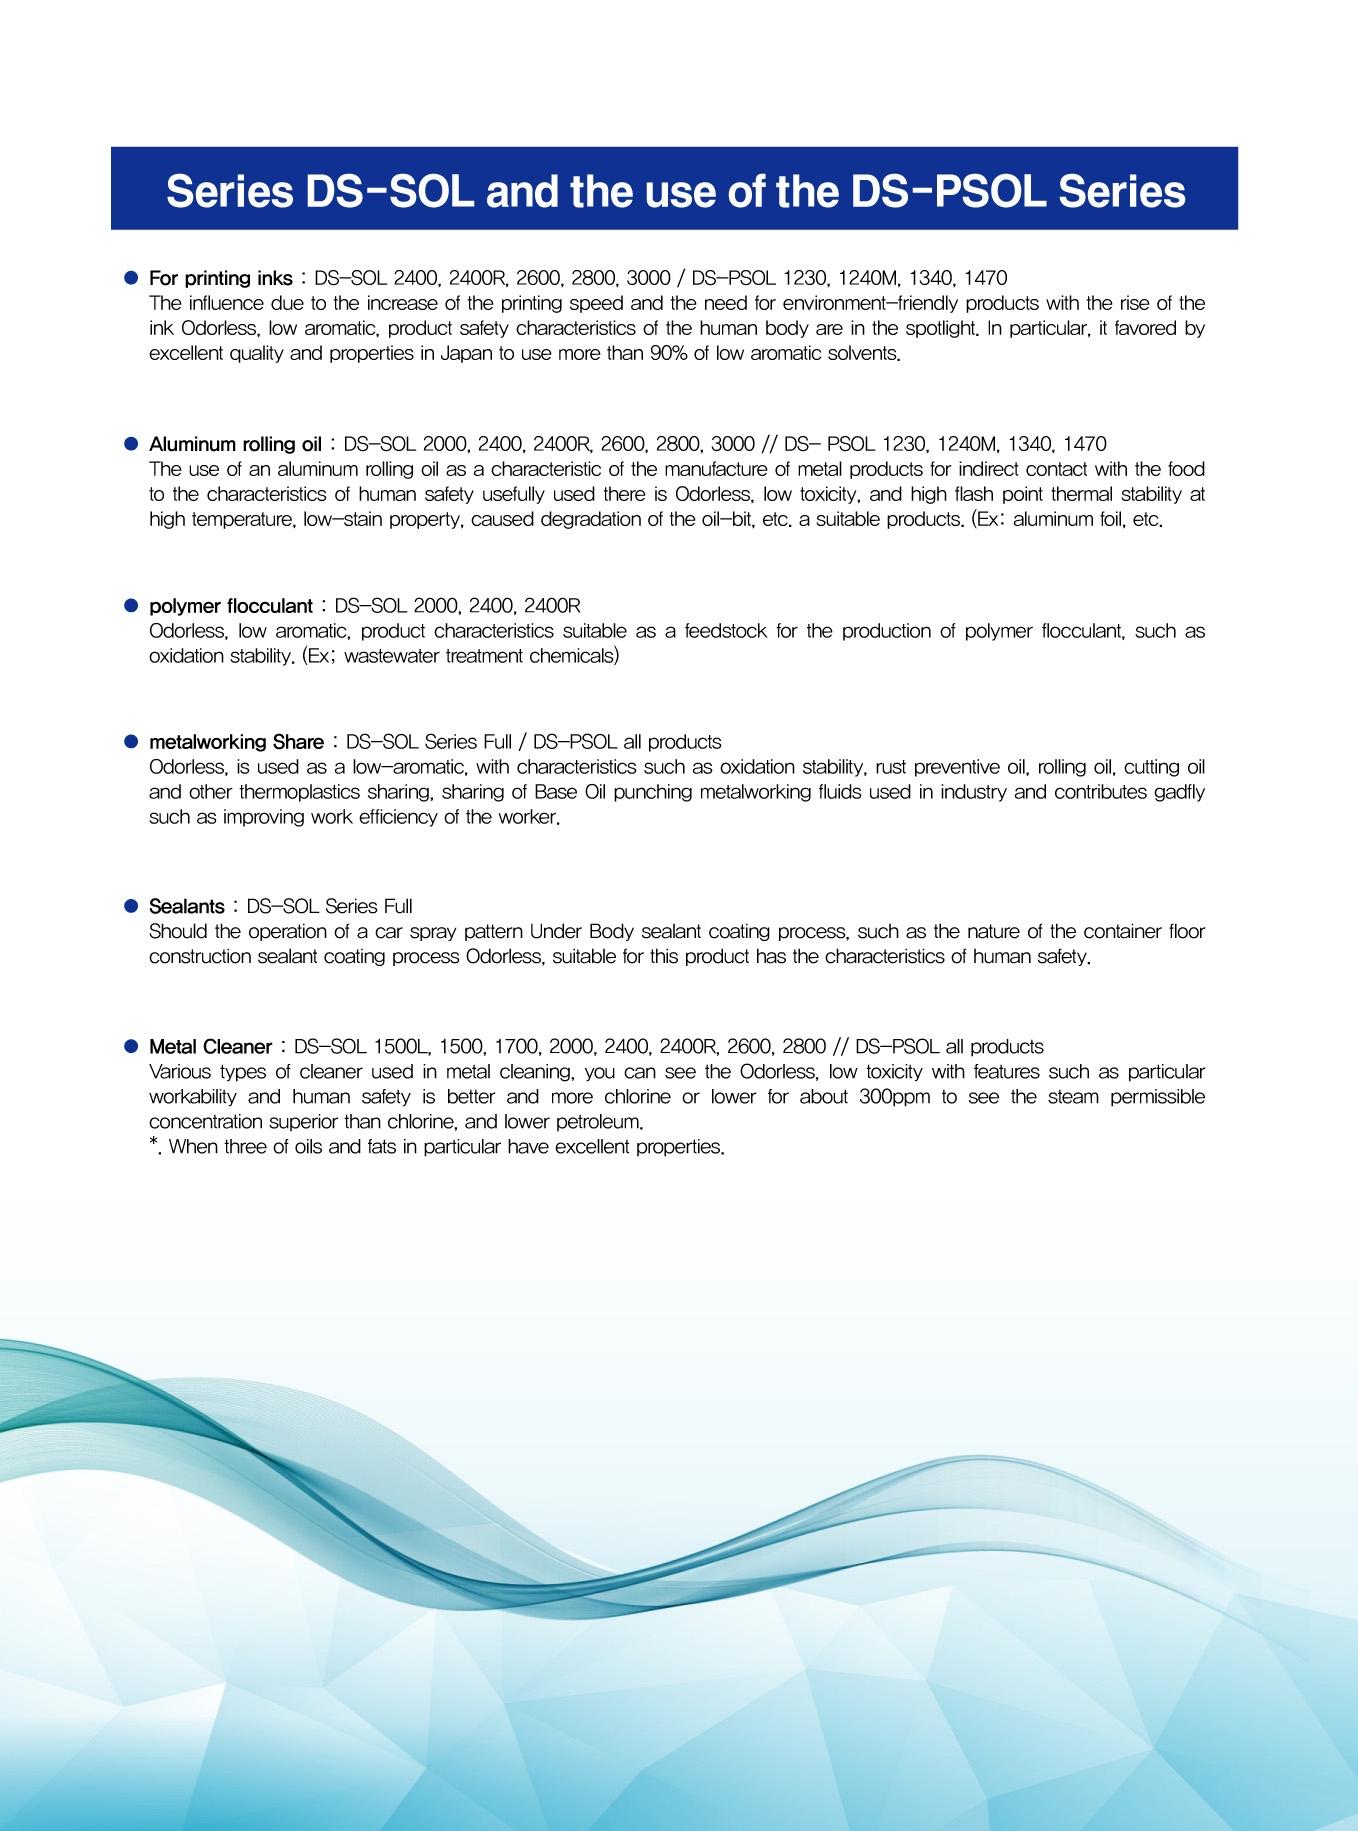 the characteristics and use of aluminium